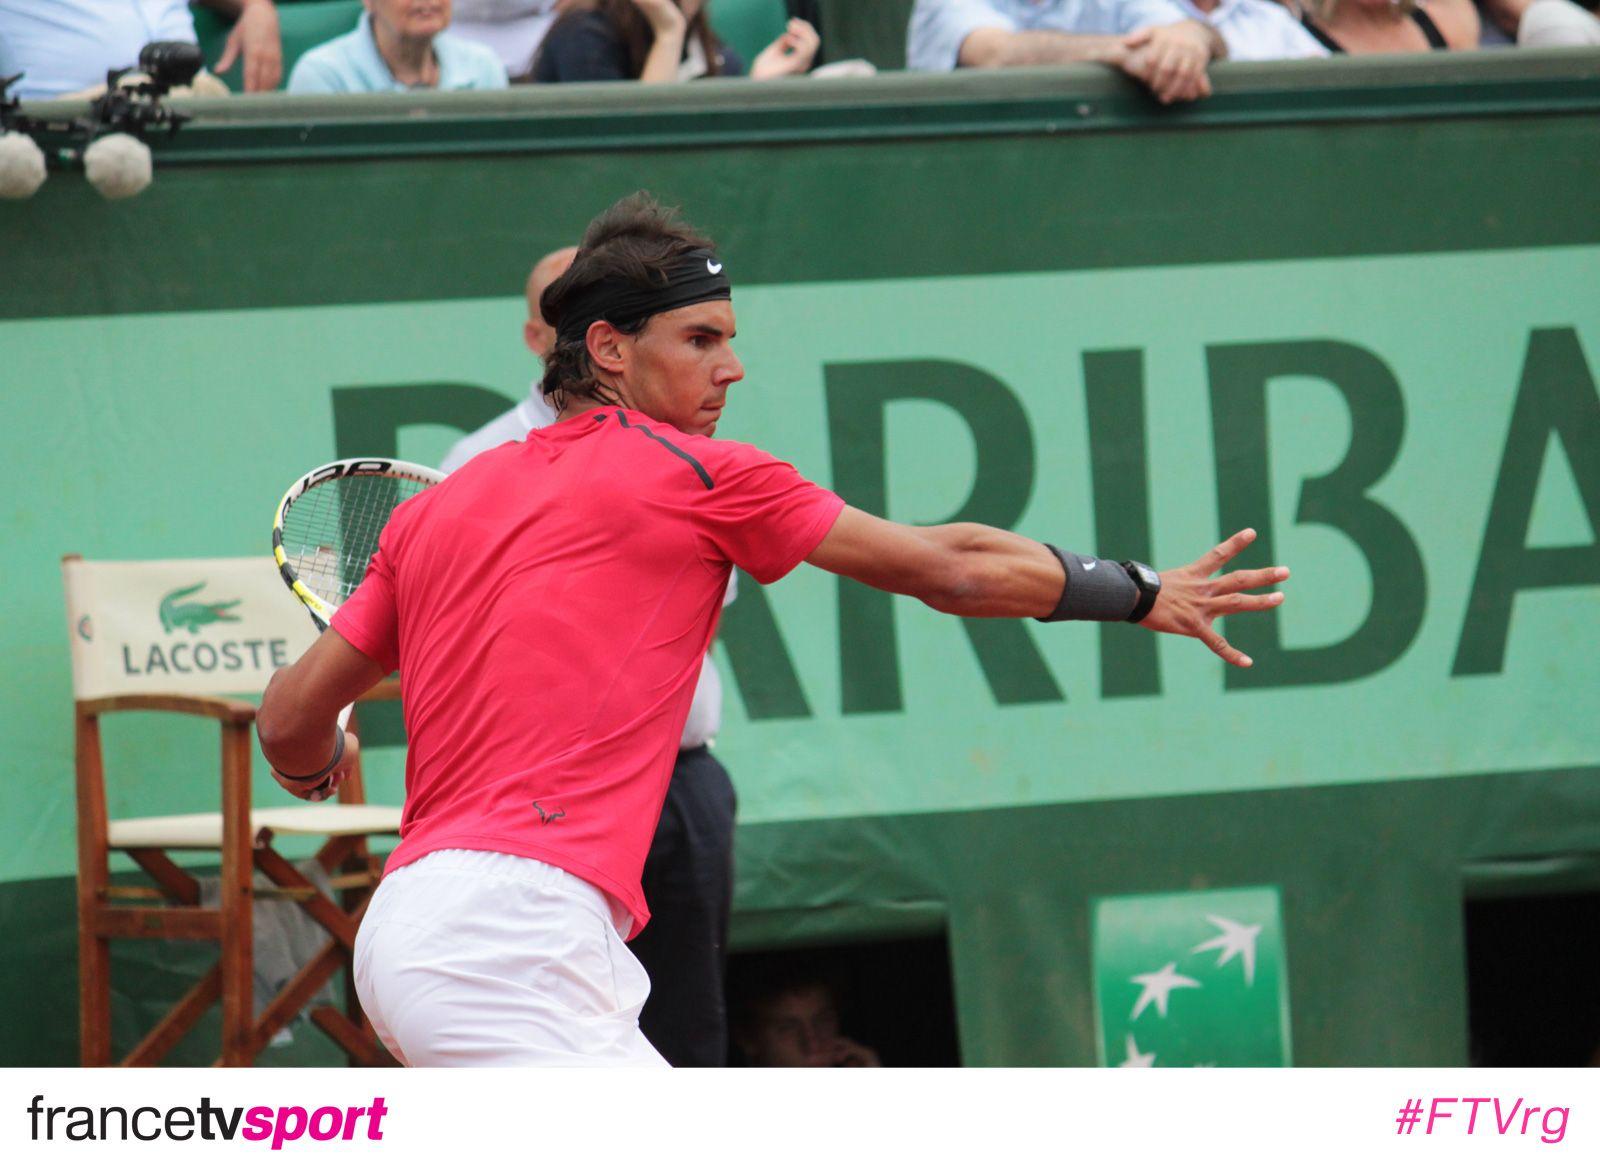 Nadal toujours aussi efficace Roland garros, Roland